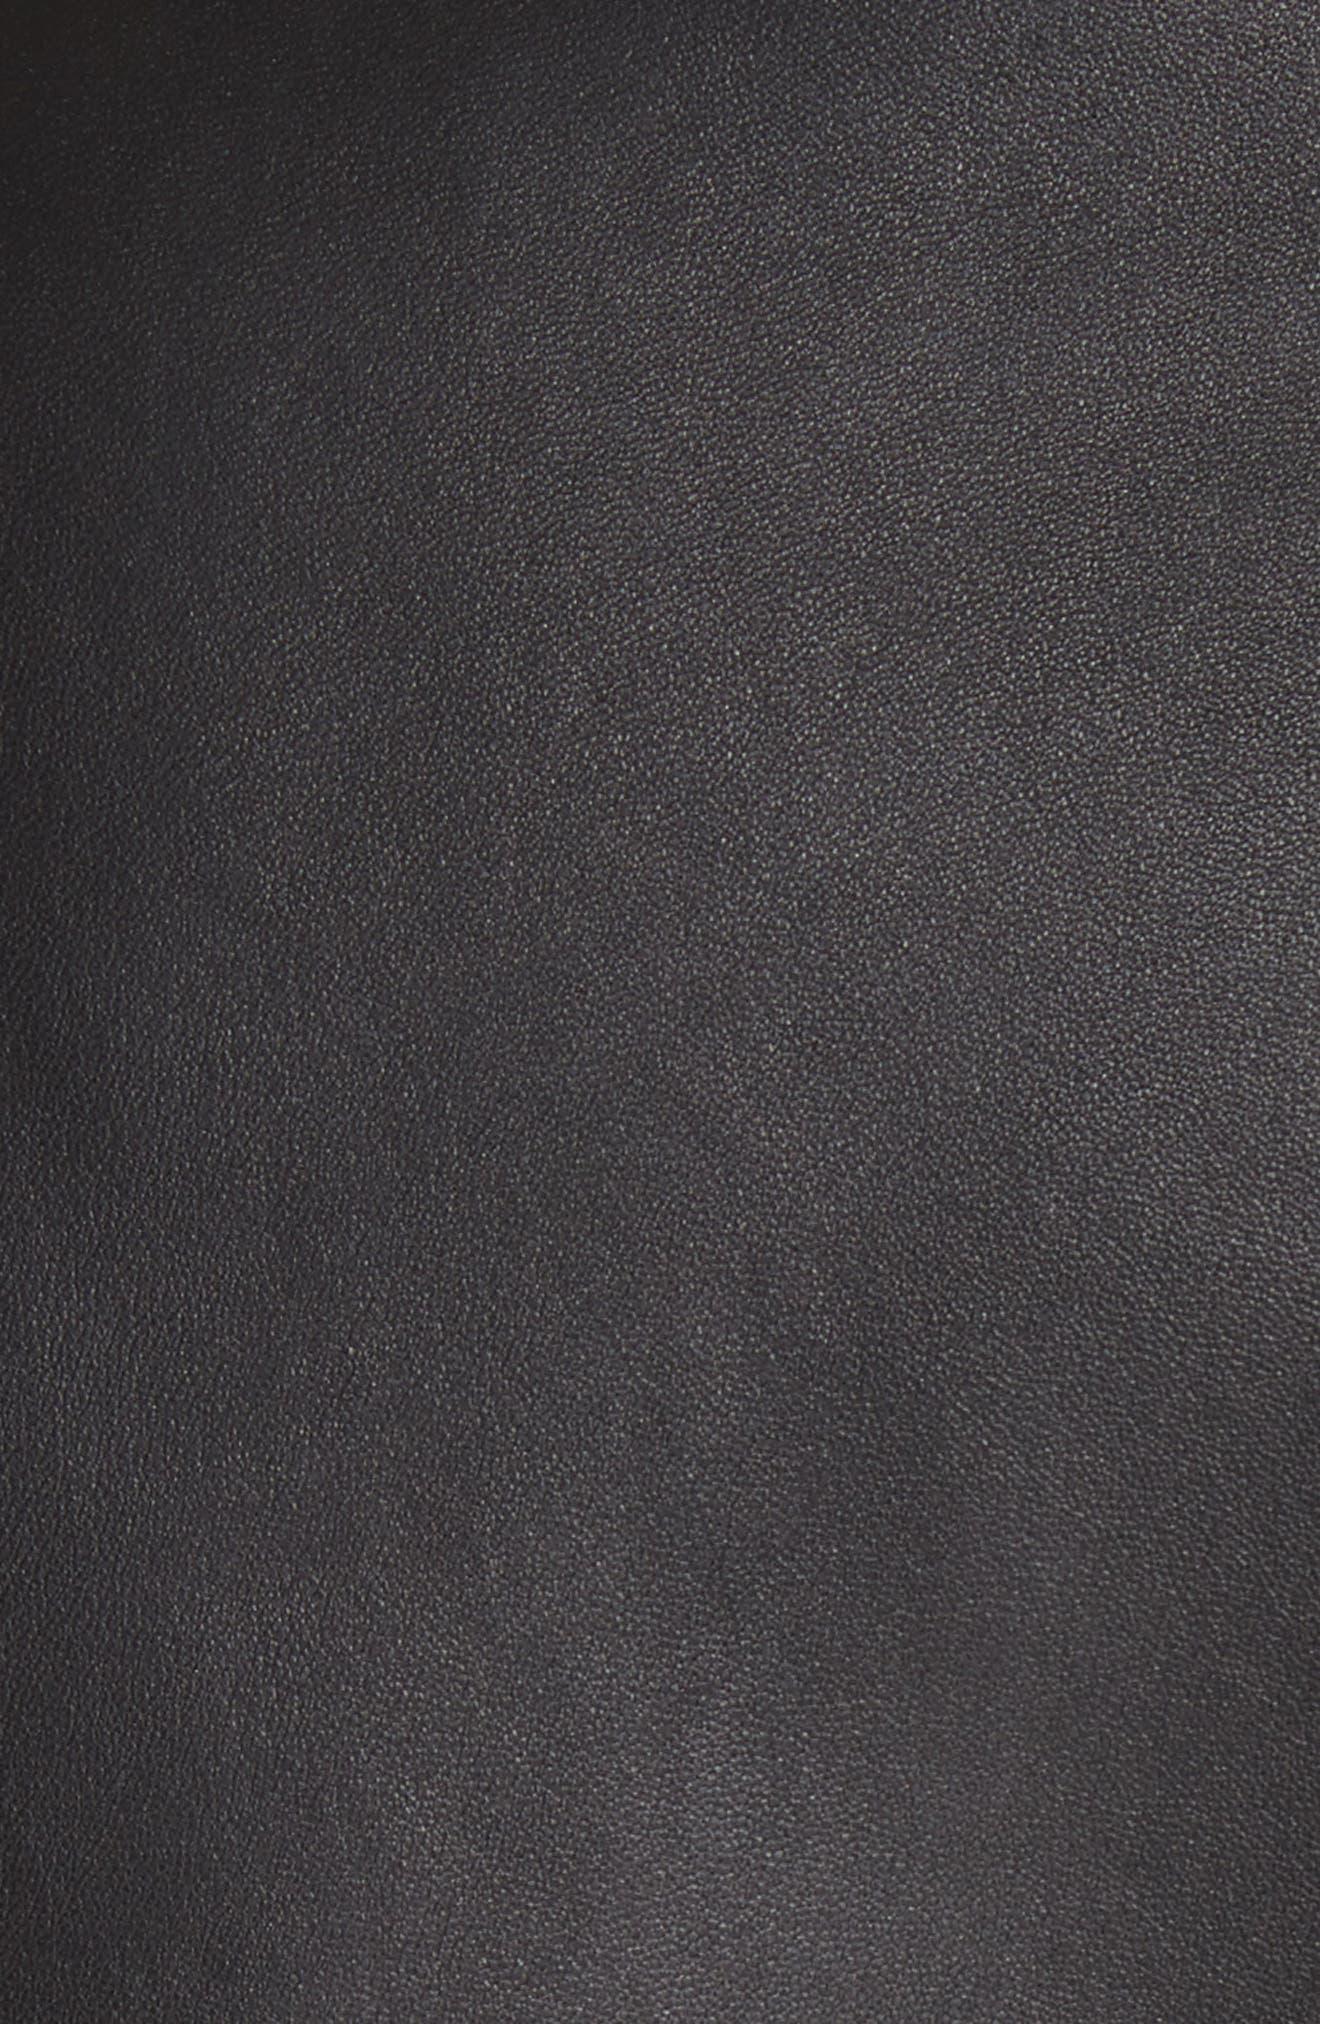 Leather Biker Jacket,                             Alternate thumbnail 5, color,                             Black/ White